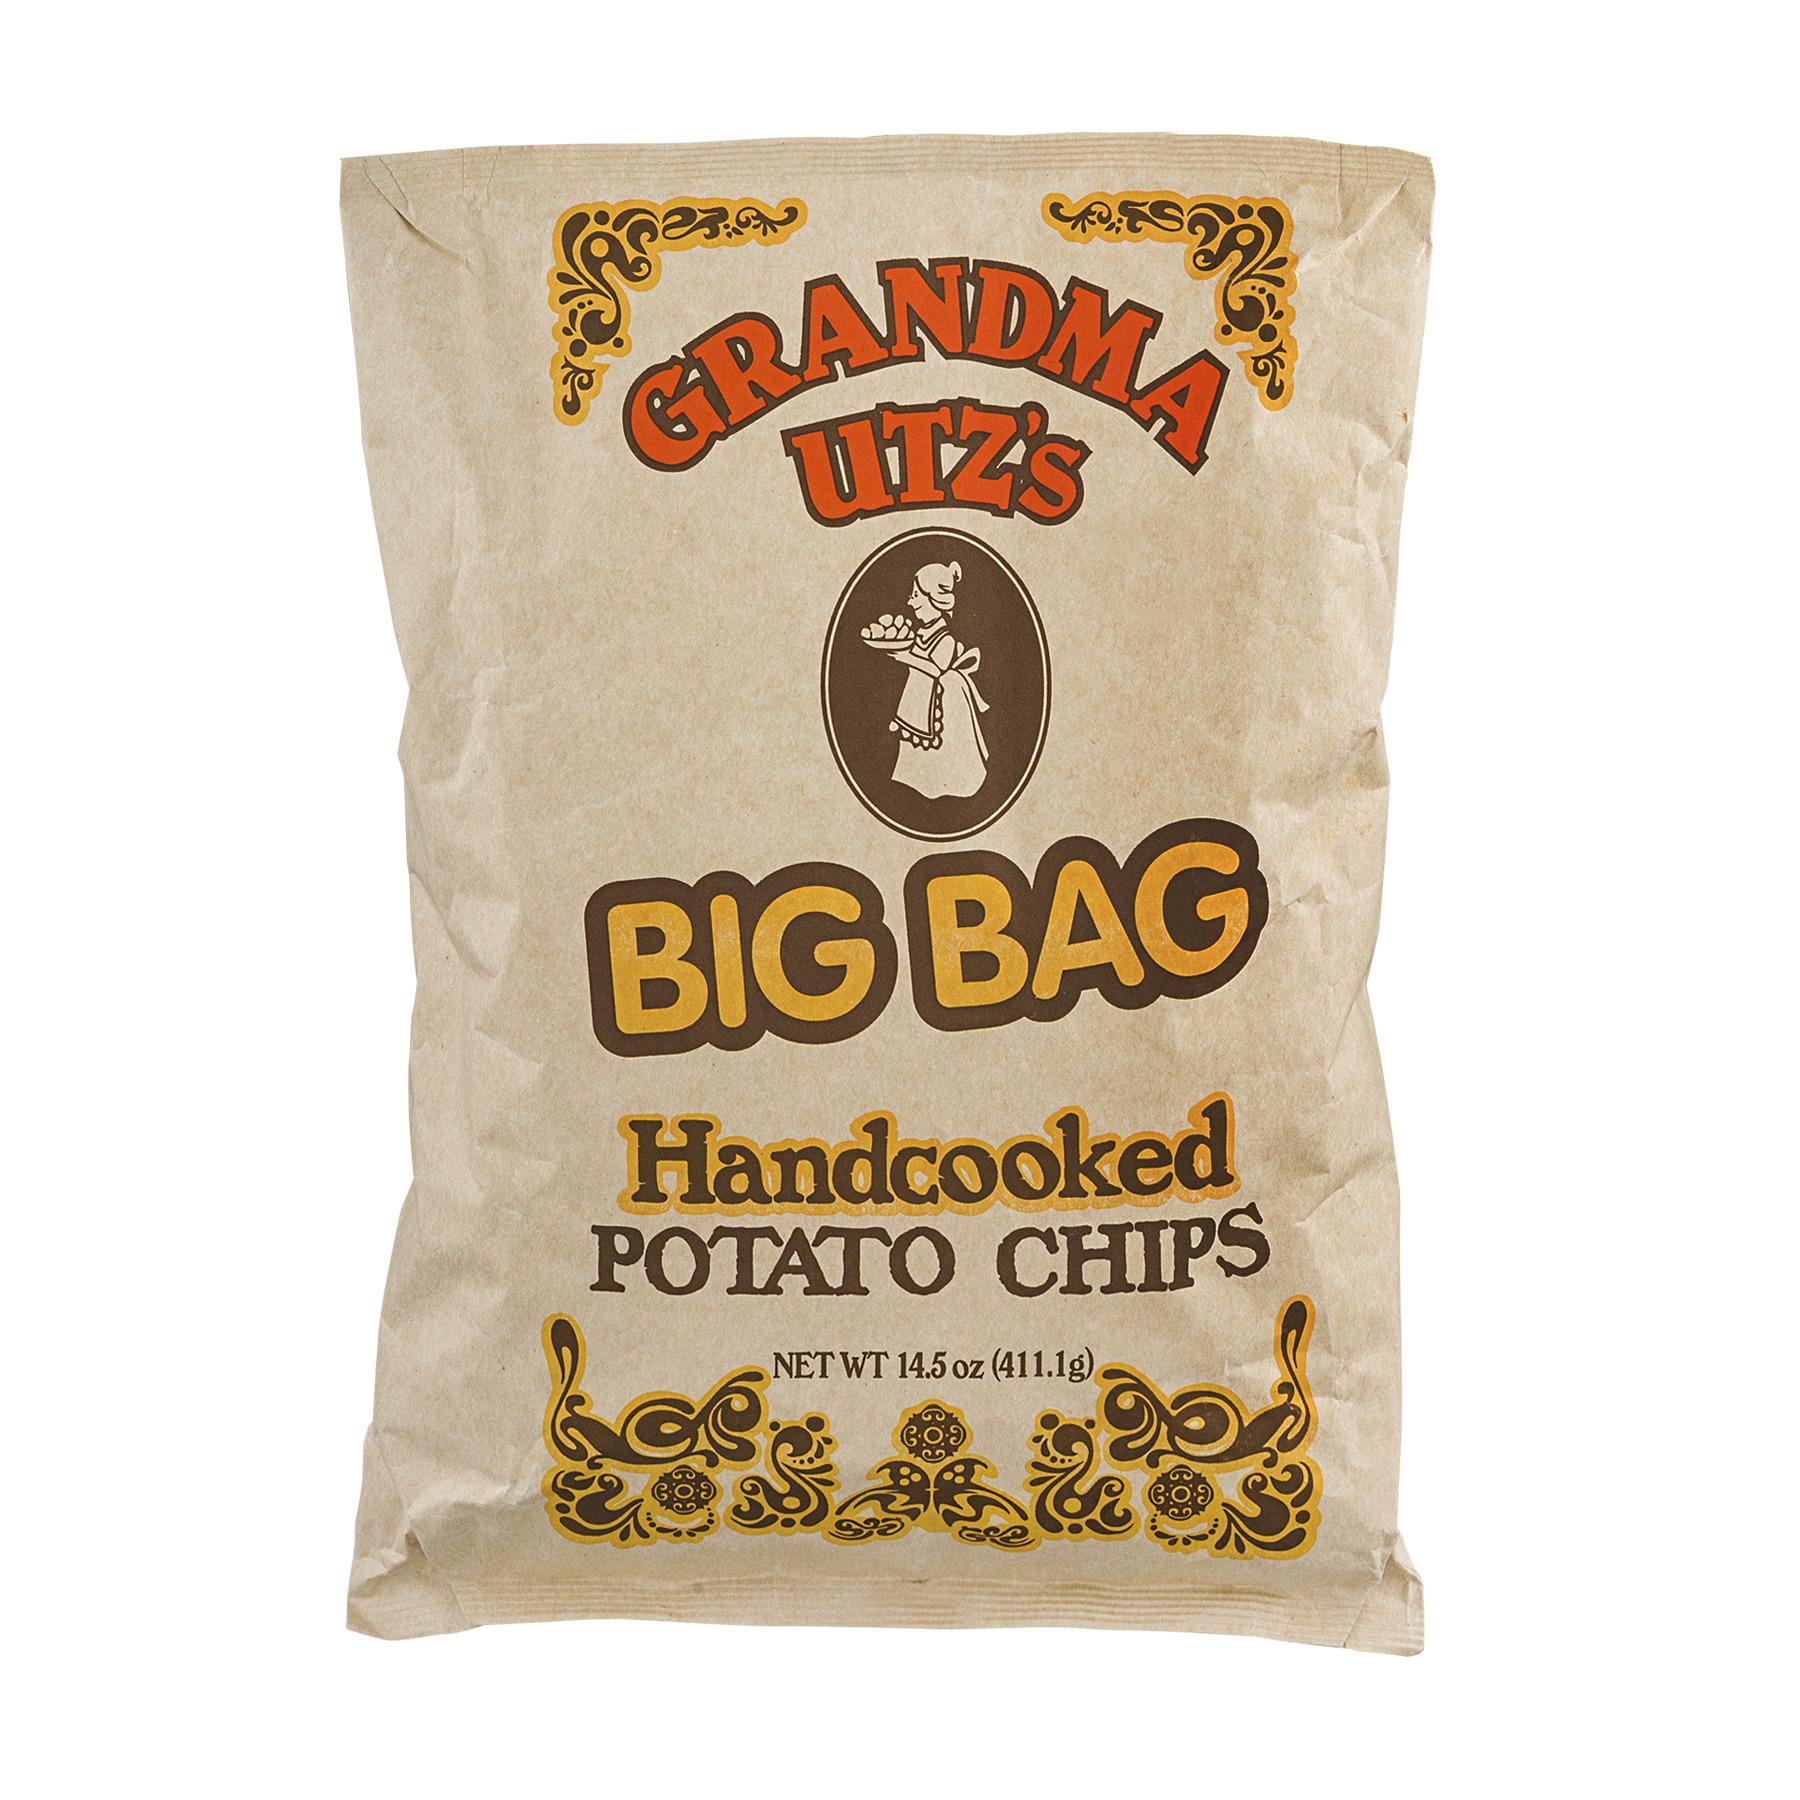 Grandma Utz's Hand cooked Potato Chips Big Bag, 14.5 Oz.